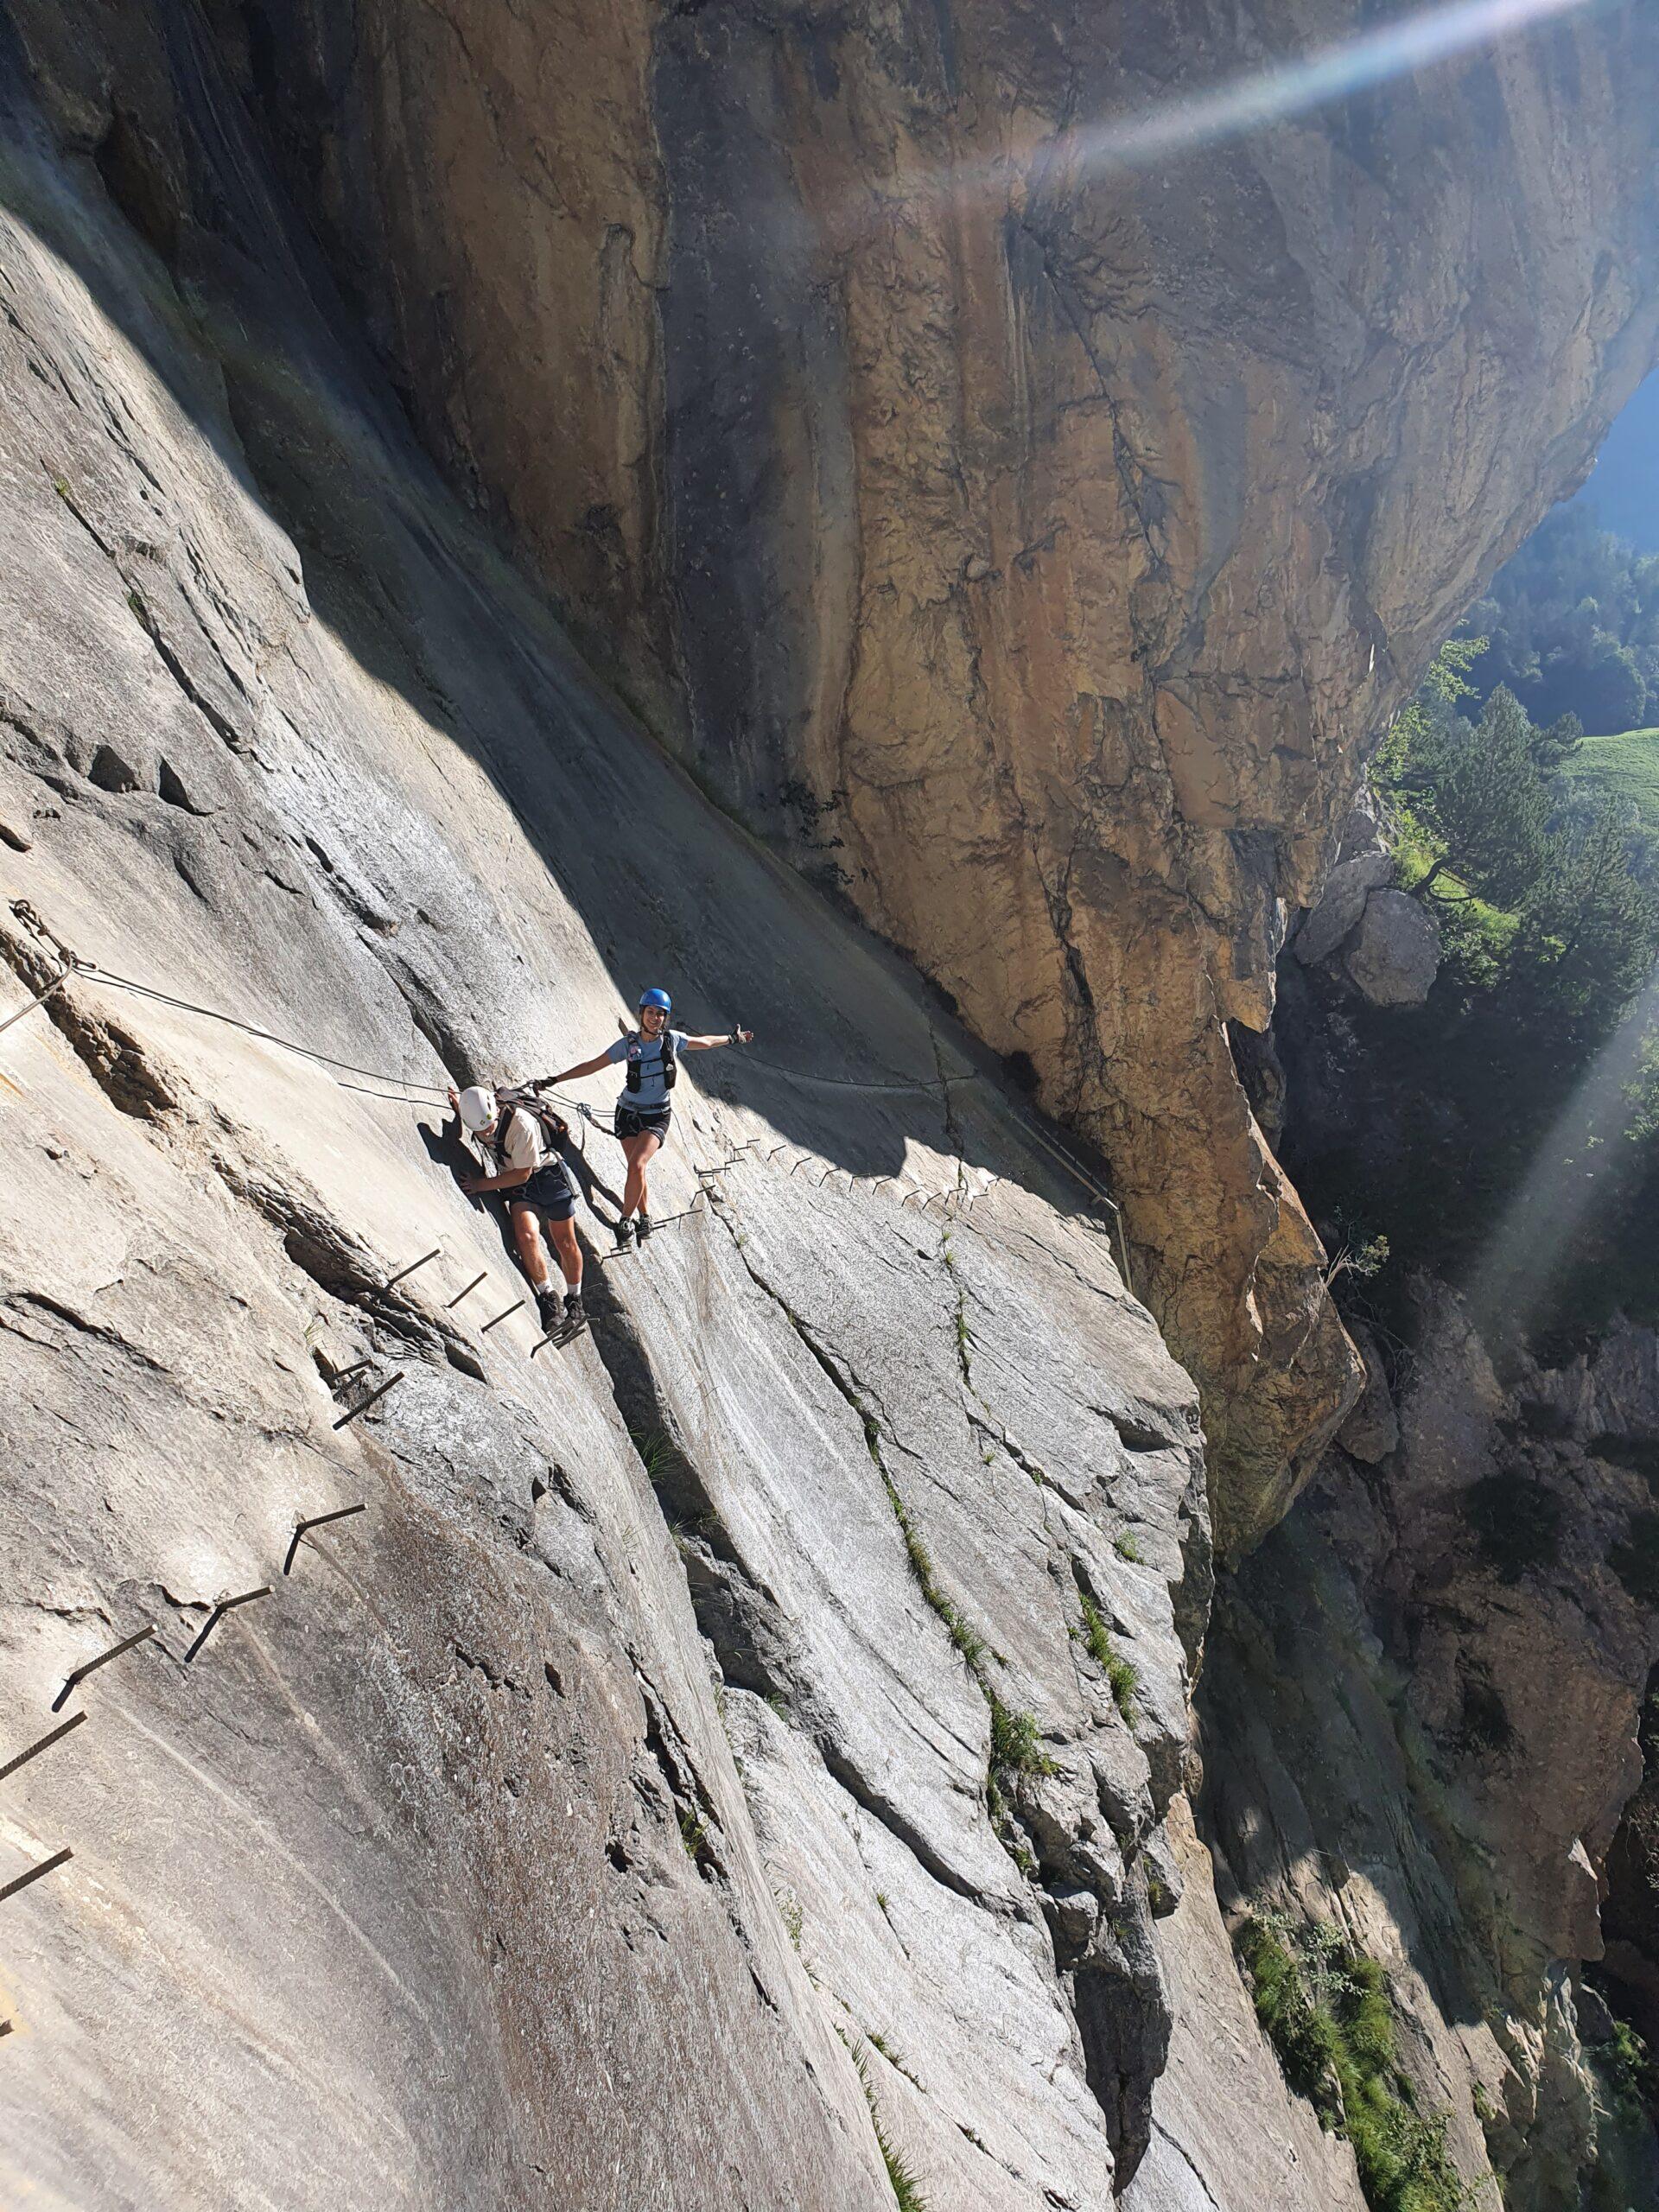 Klettersteig Allmenalp in Kandersteg